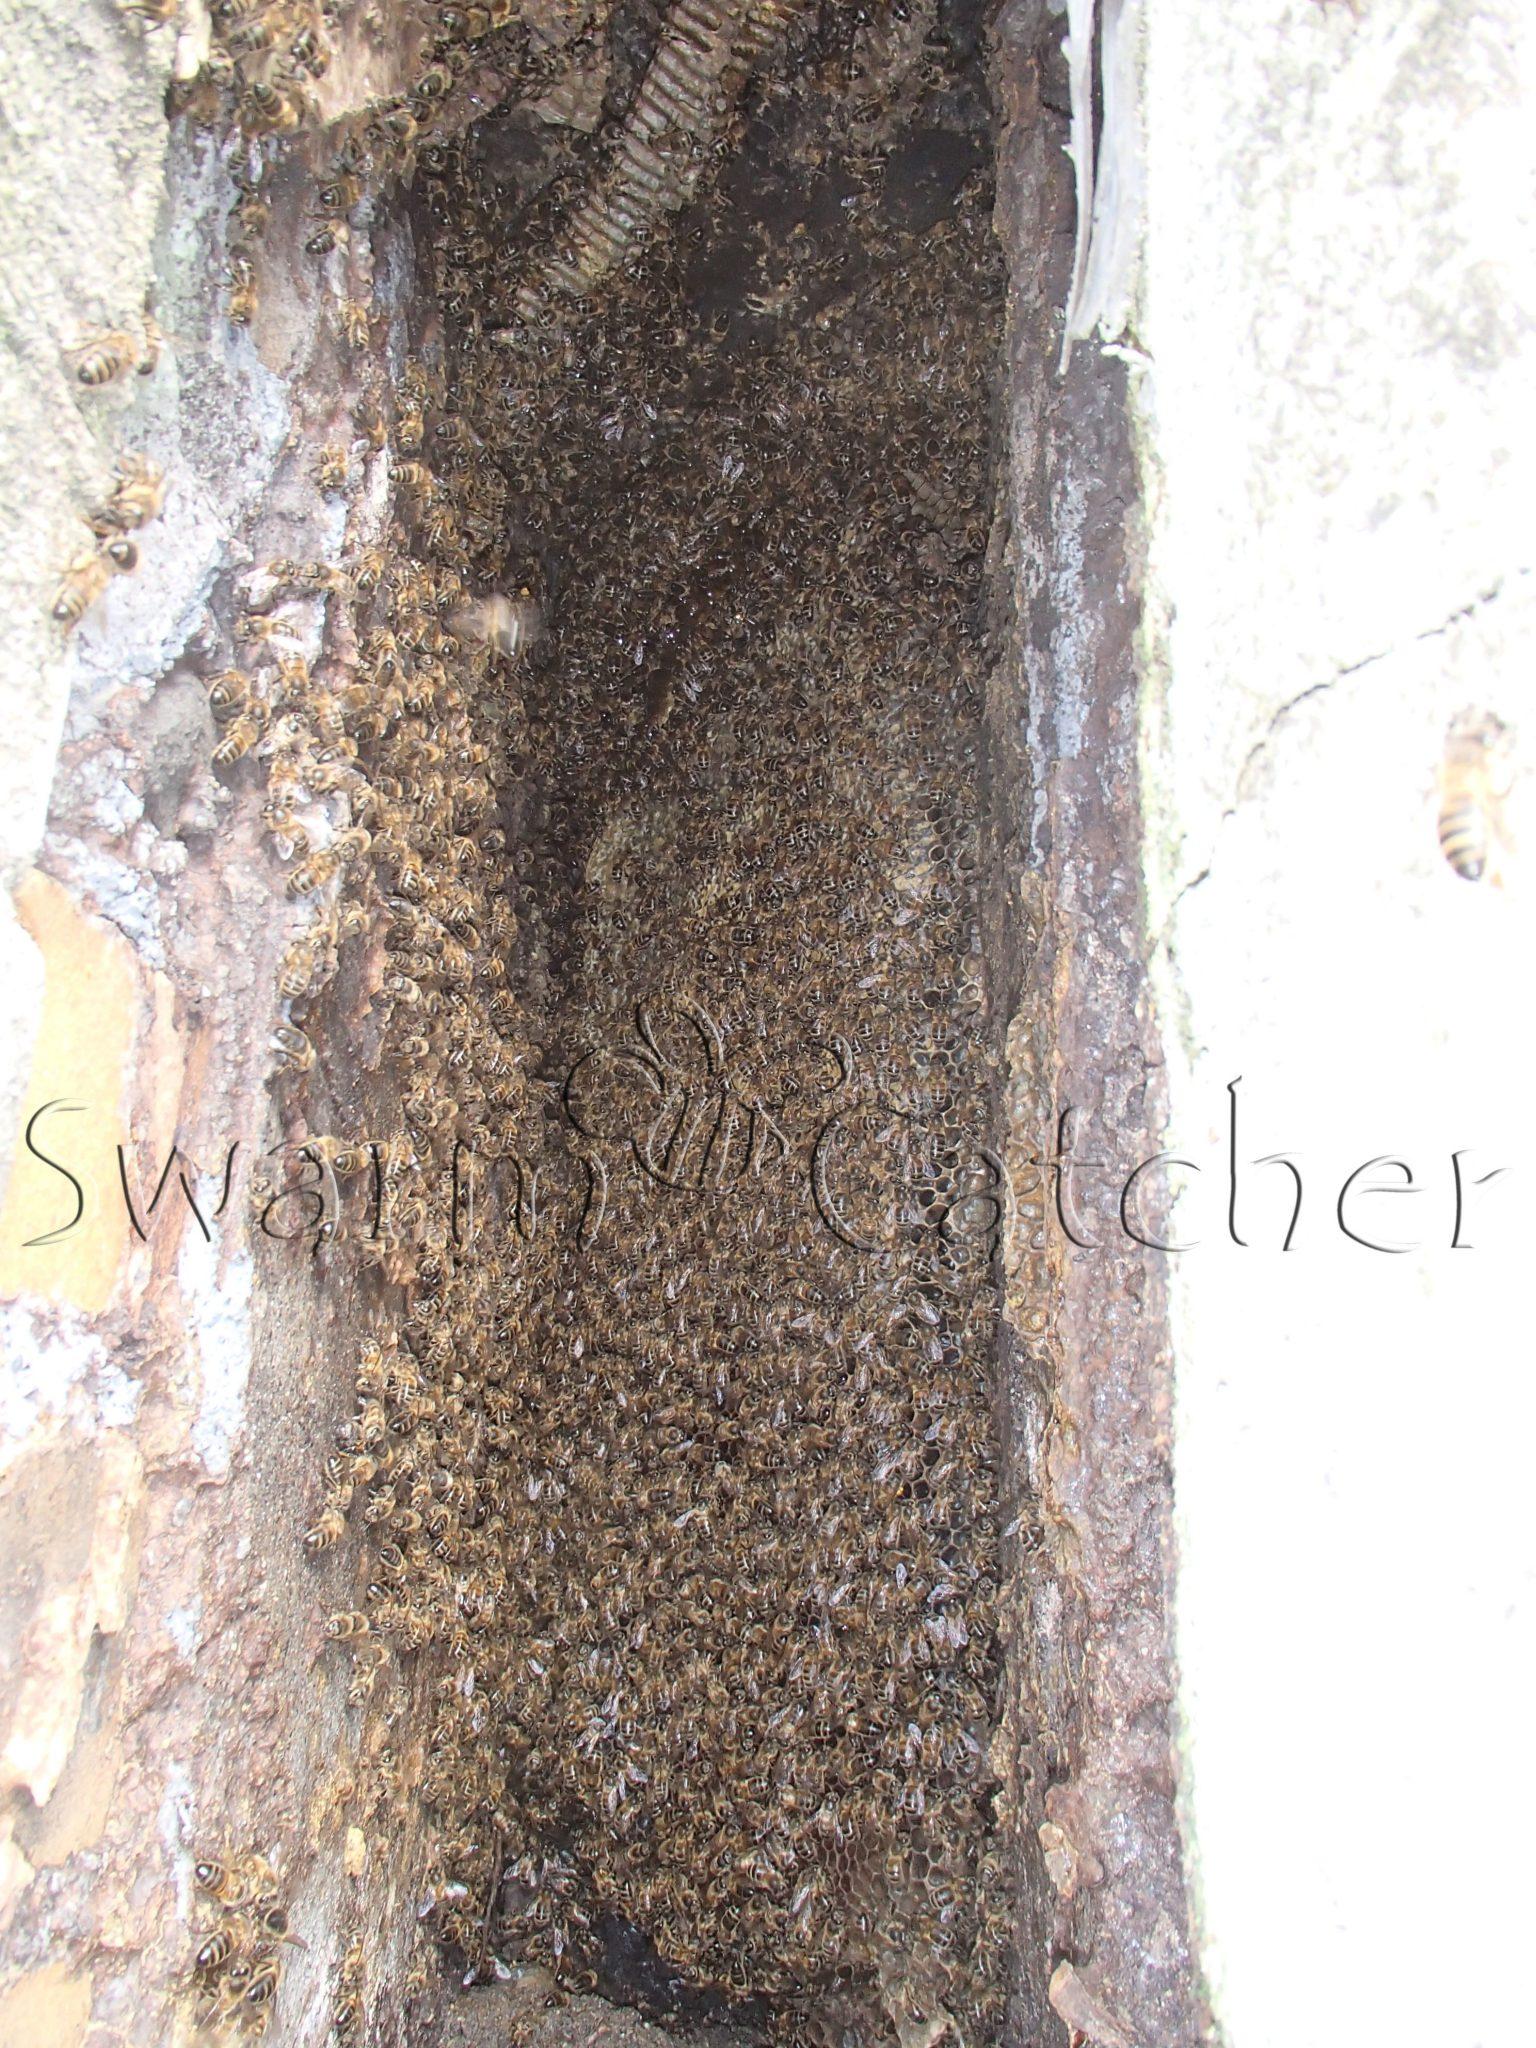 Bees in walls - Honey bee colony in church wall window slot